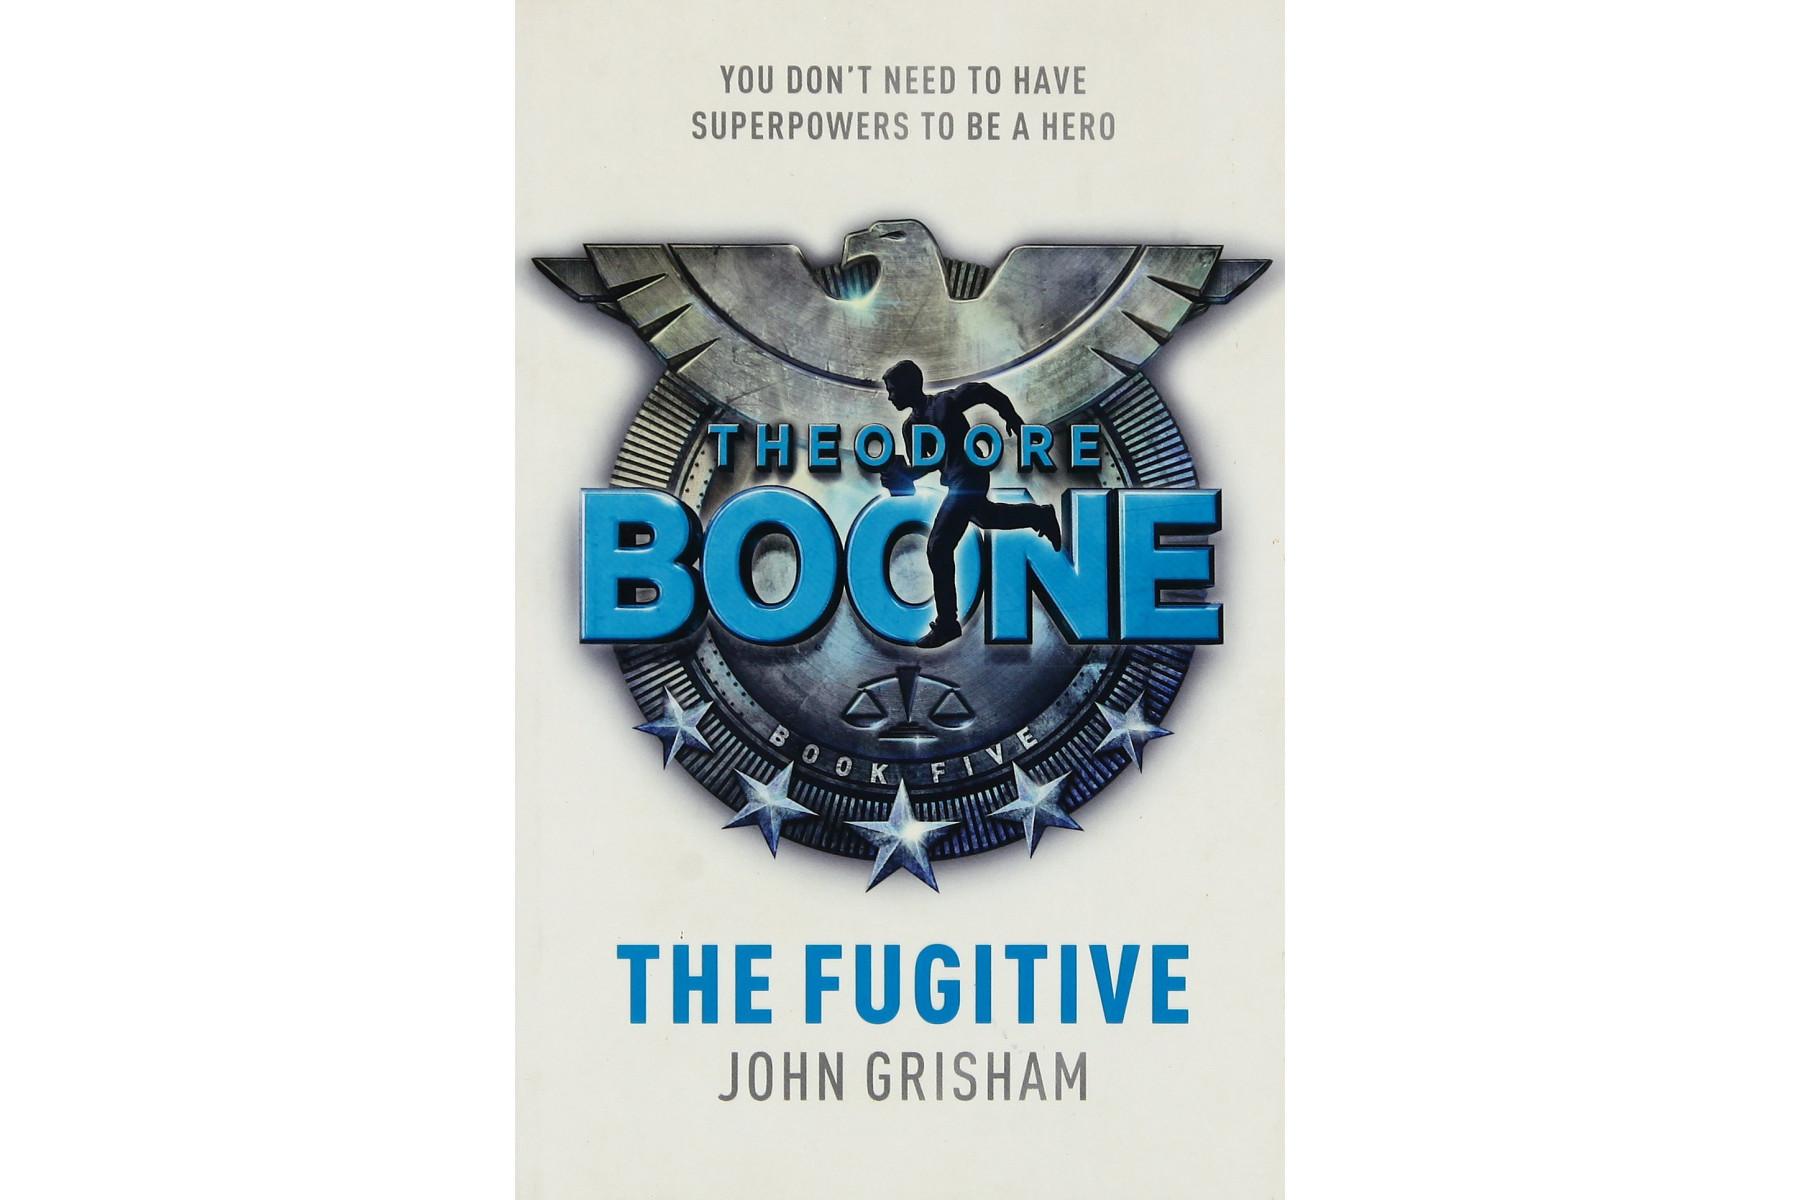 Theodore Boone: The Fugitive (Book 5)